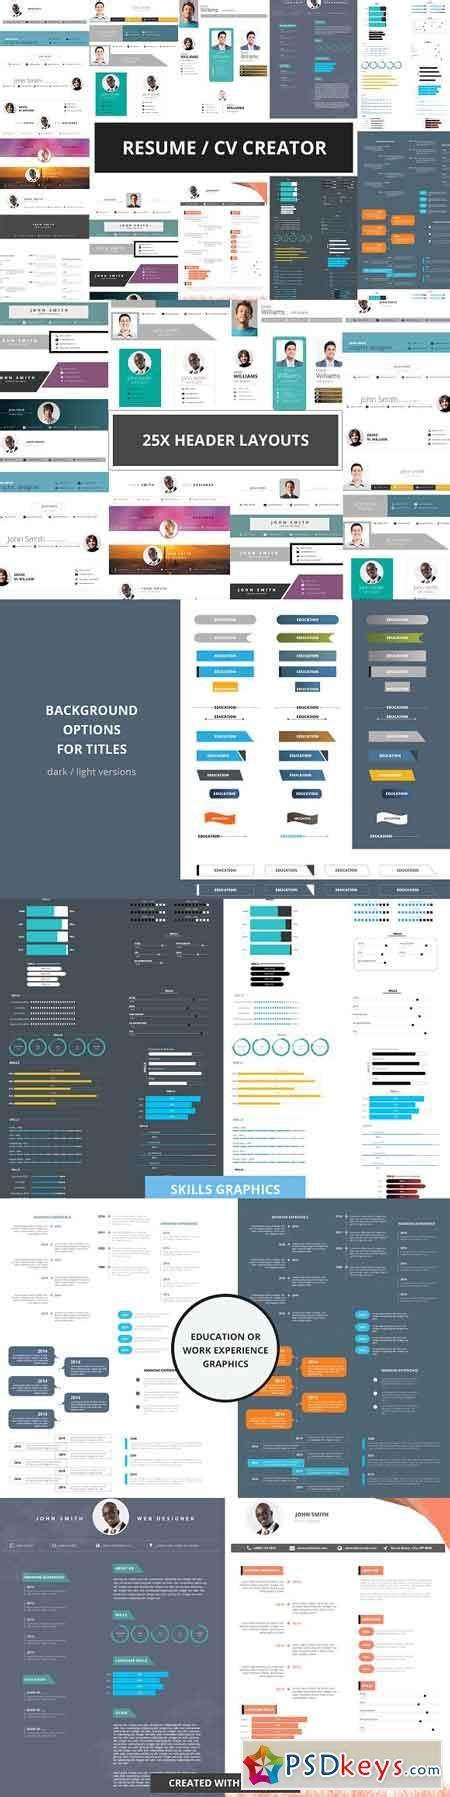 Resume Header Creator by Resume Cv Creator Kit 1425226 187 Free Photoshop